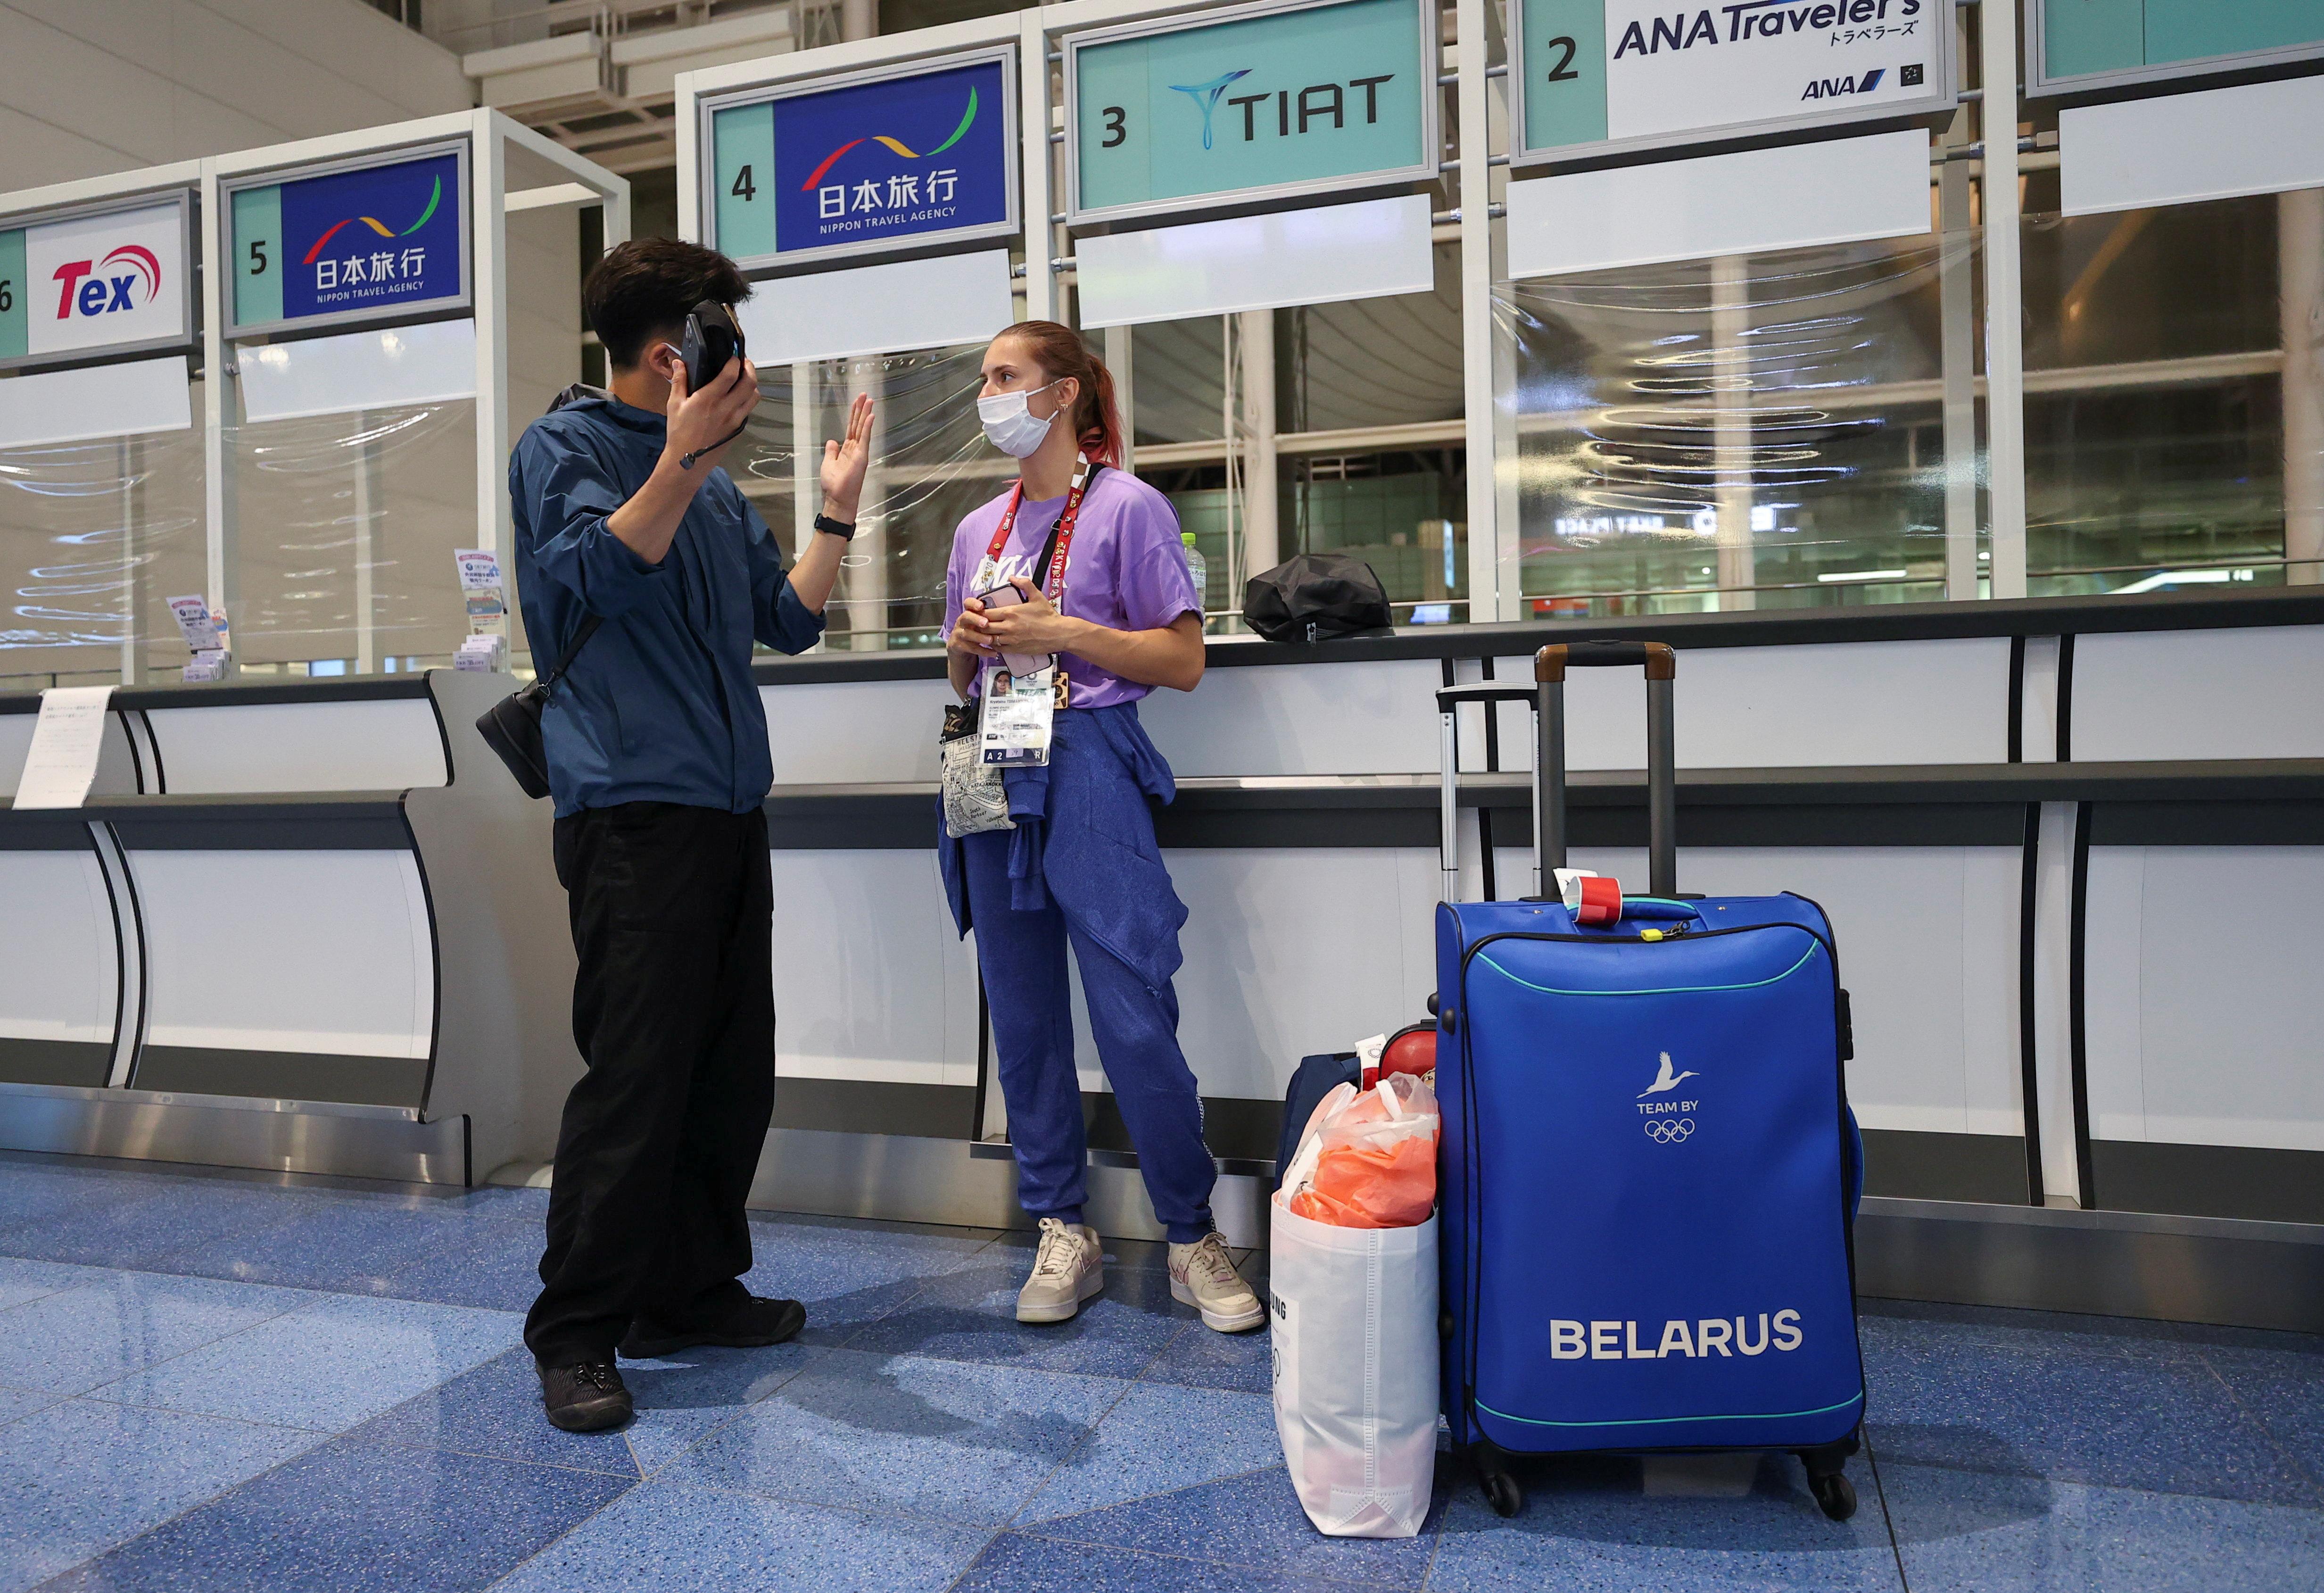 Belarusian athlete Krystsina Tsimanouskaya is seen at Haneda international airport in Tokyo, Japan August 1, 2021.  REUTERS/Issei Kato